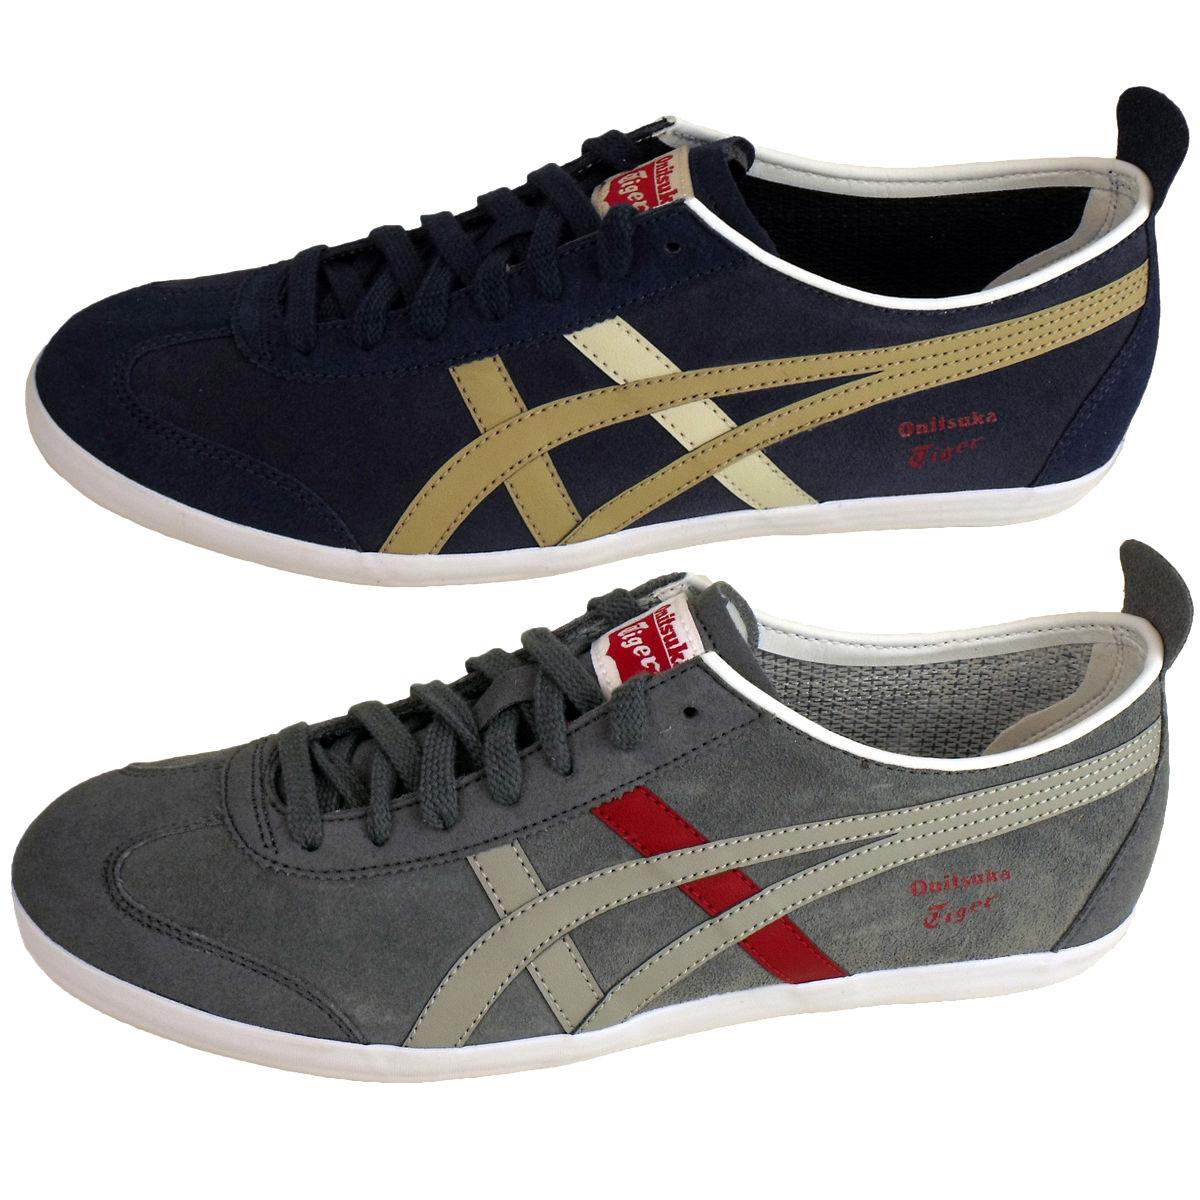 Ladies Tiger Shoes